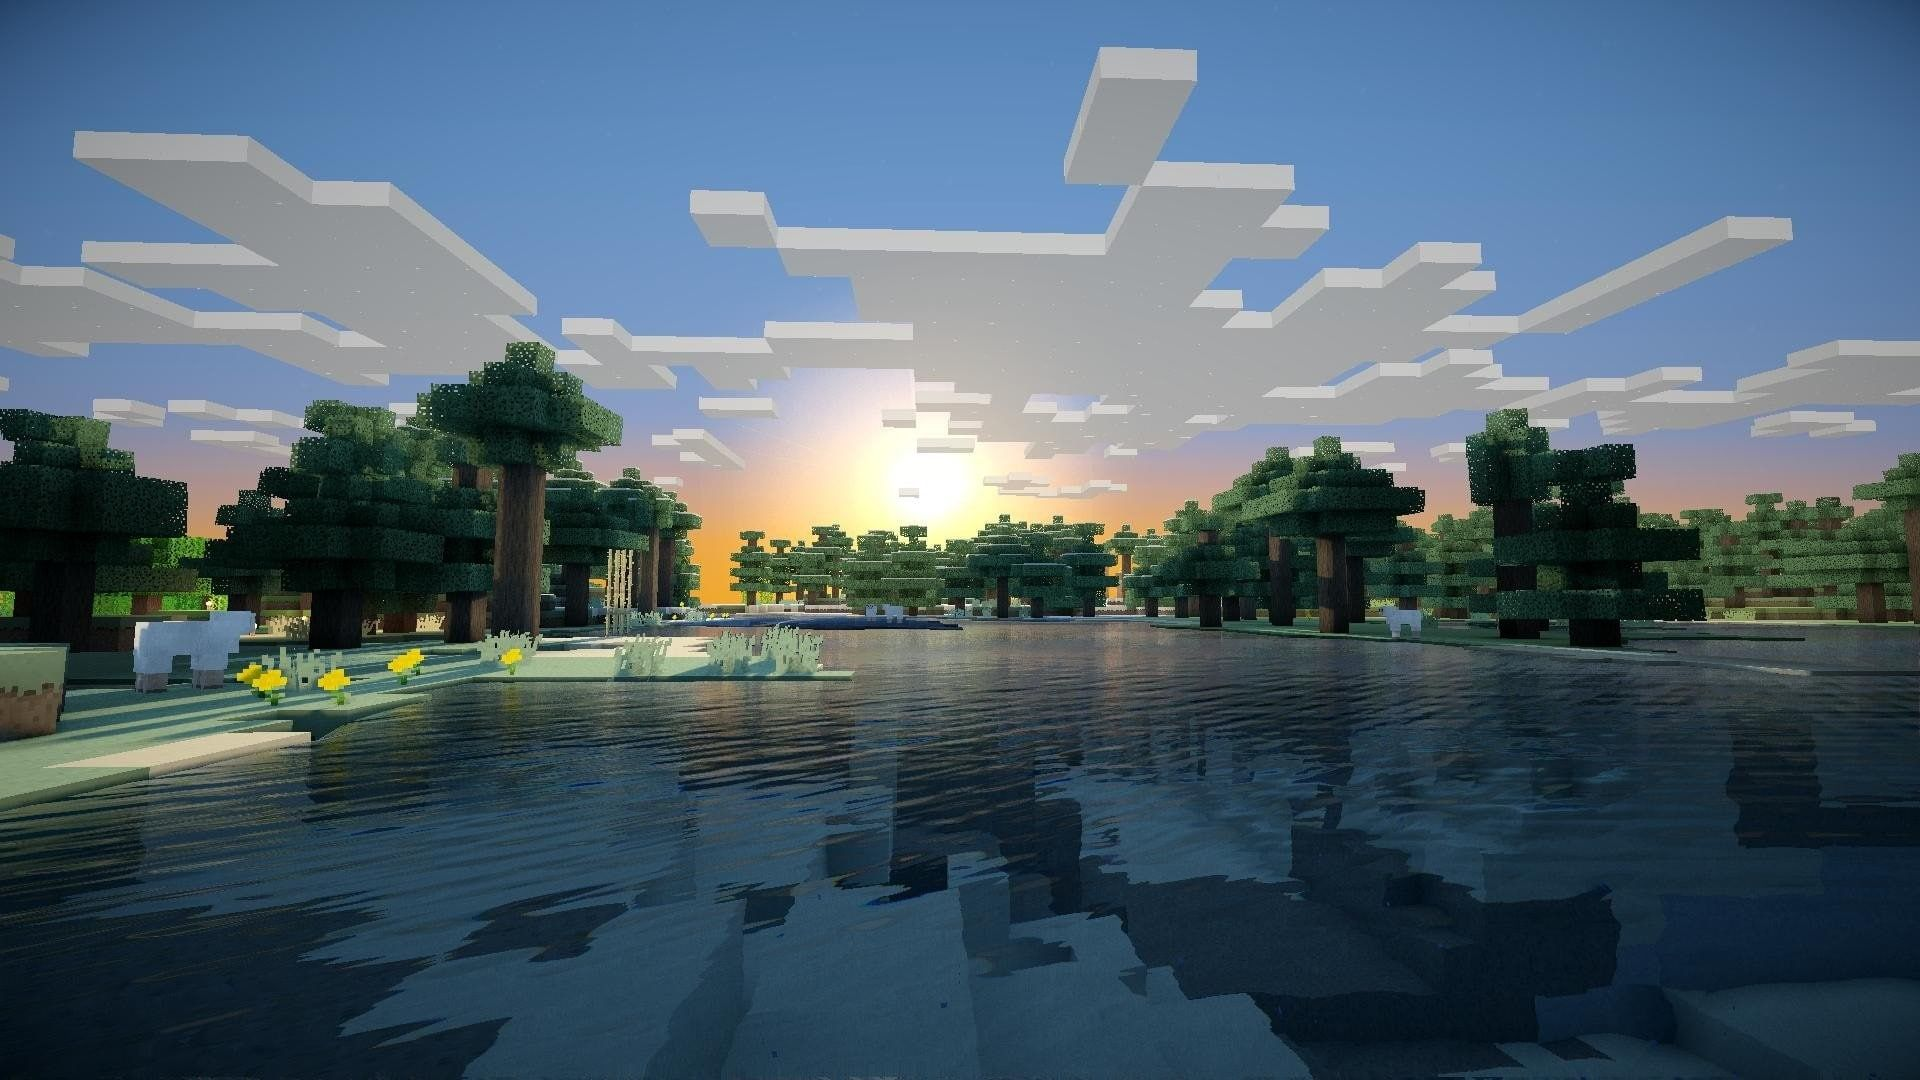 Minecraft Widescreen Retina Imac 1080p Wallpaper Hdwallpaper Desktop Minecraft Wallpaper Aesthetic Wallpapers Minecraft Pictures